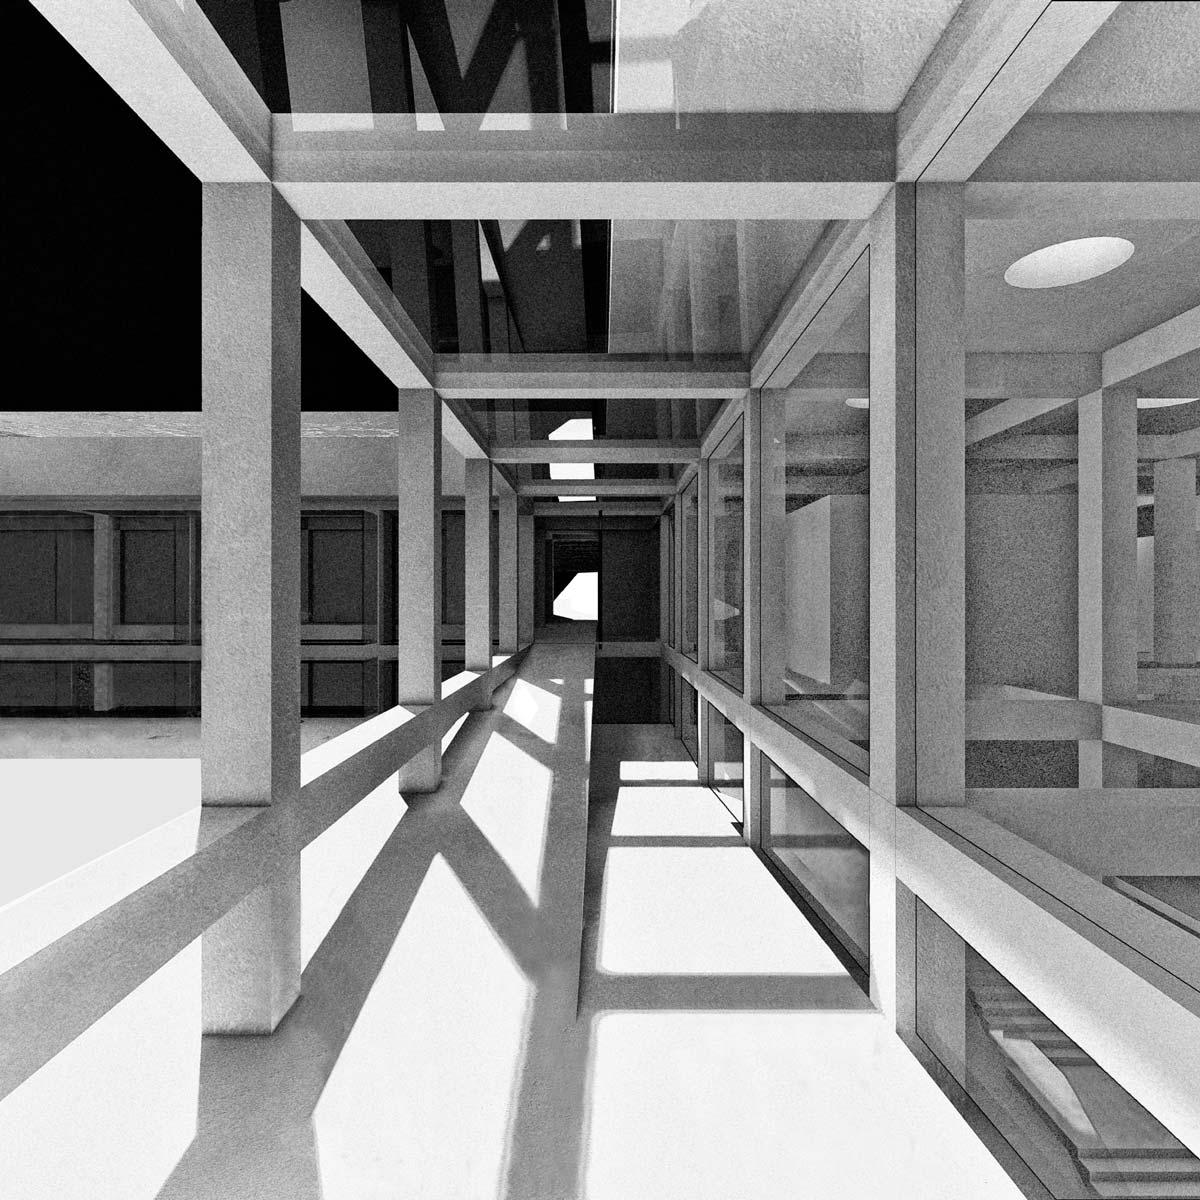 Degli-Esposti-Architetti_Helsinki-Central-Library_09